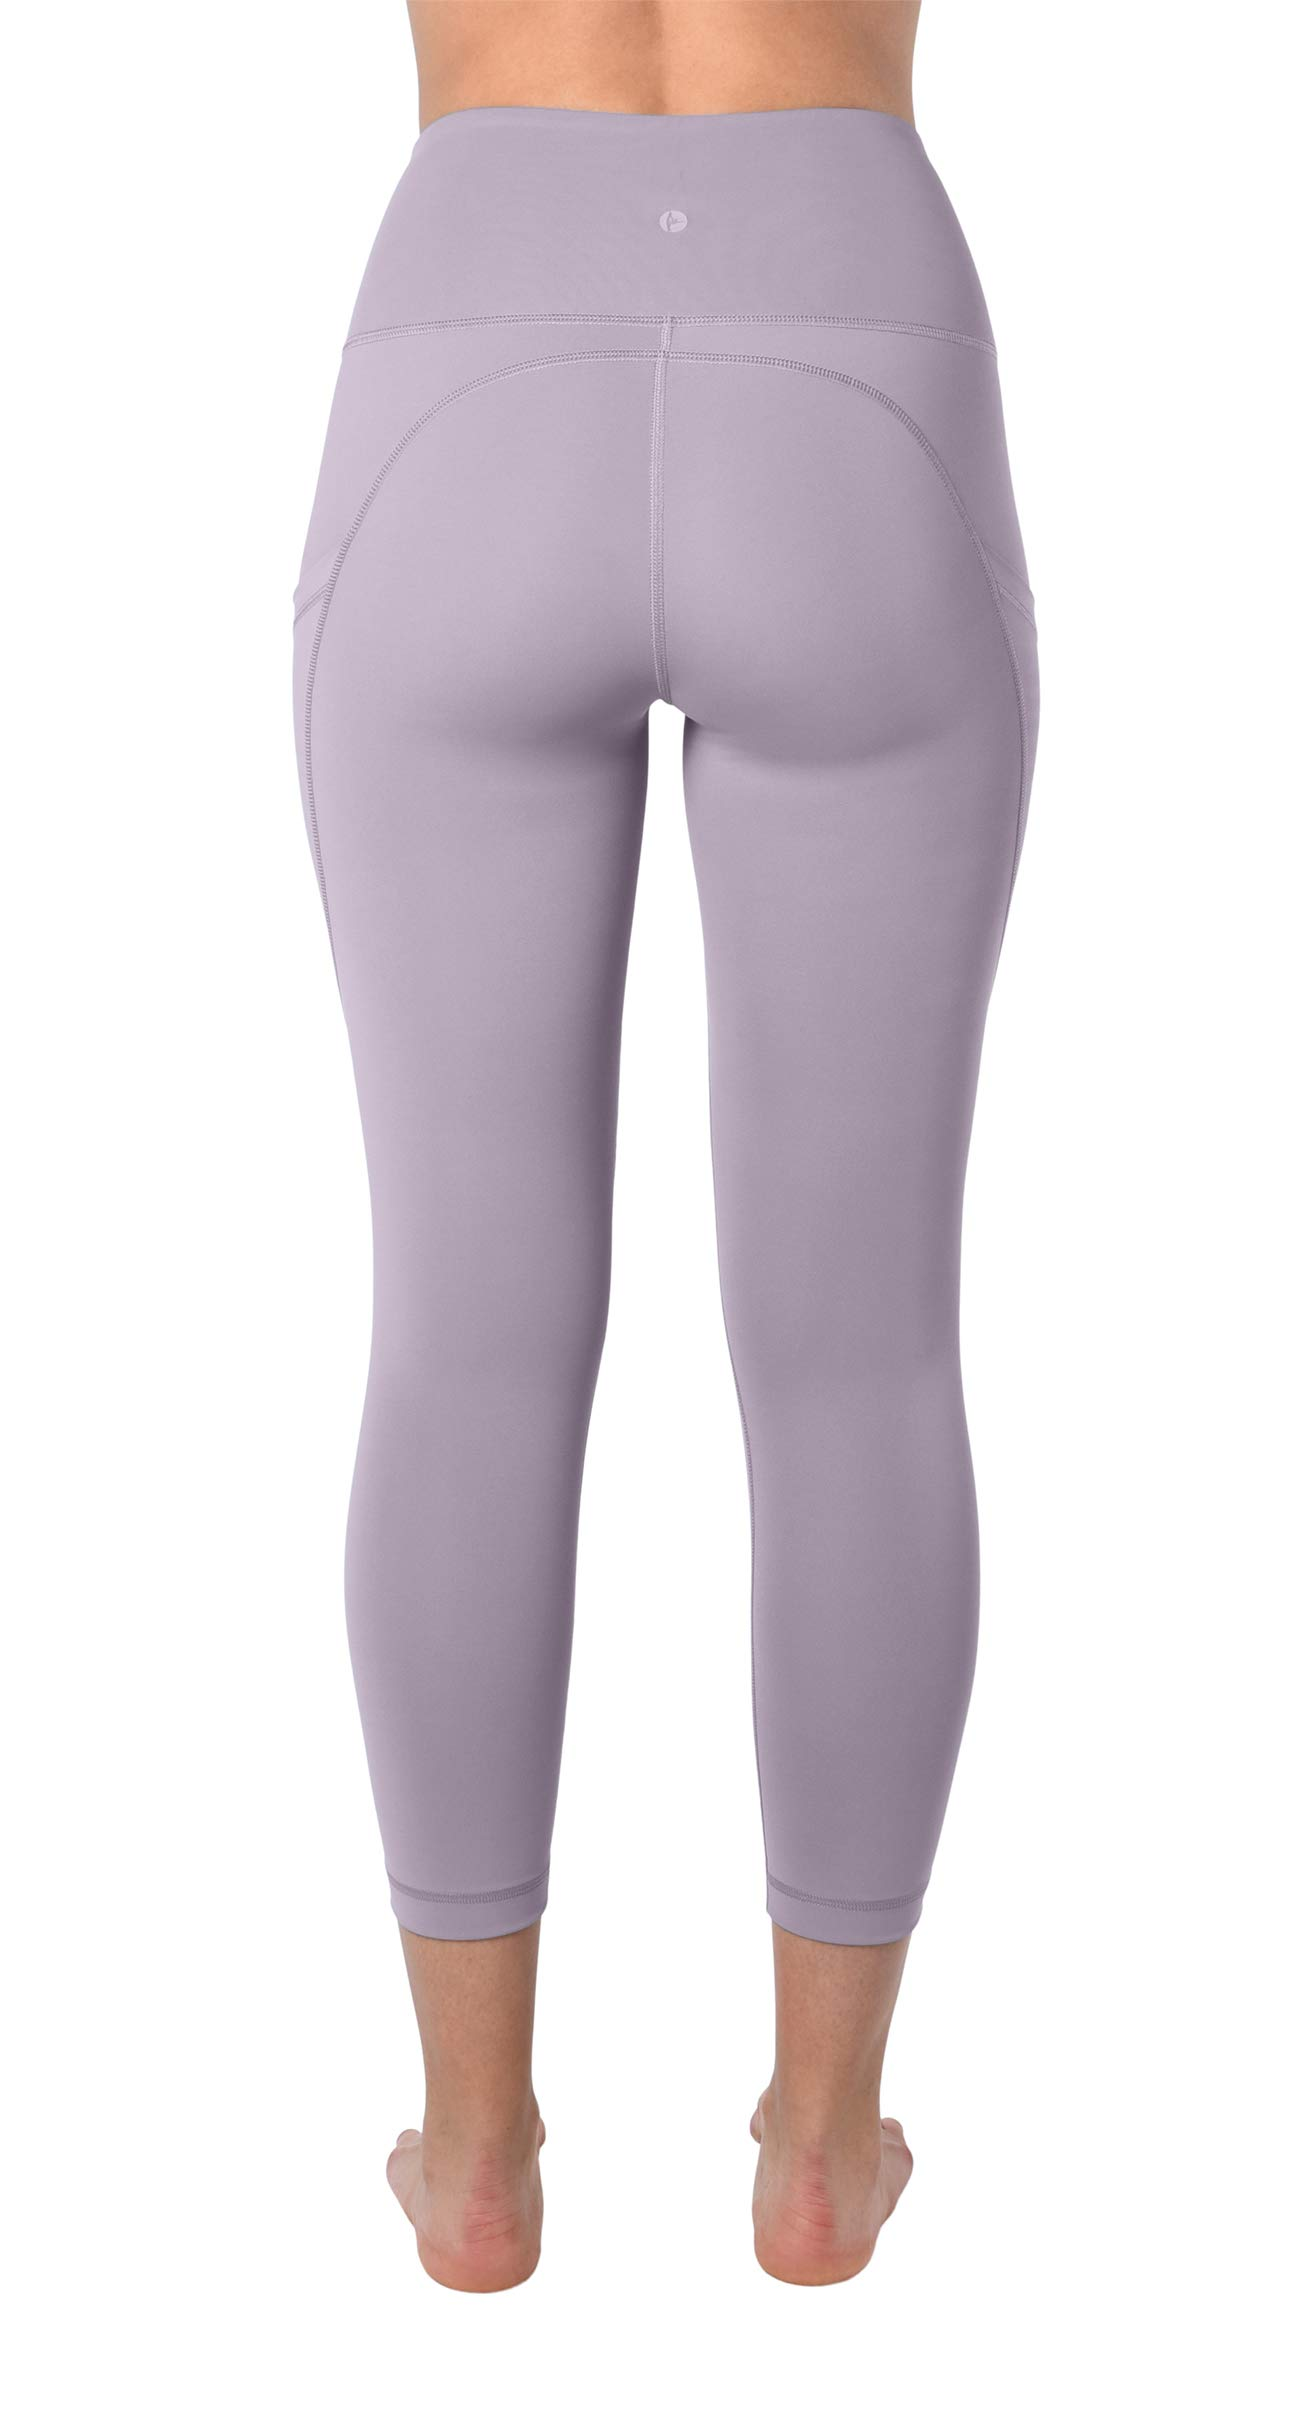 90 Degree By Reflex 22'' Yoga Capris - Yoga Leggings - Yoga Capris for Women - Iced Mauve - XS by 90 Degree By Reflex (Image #3)